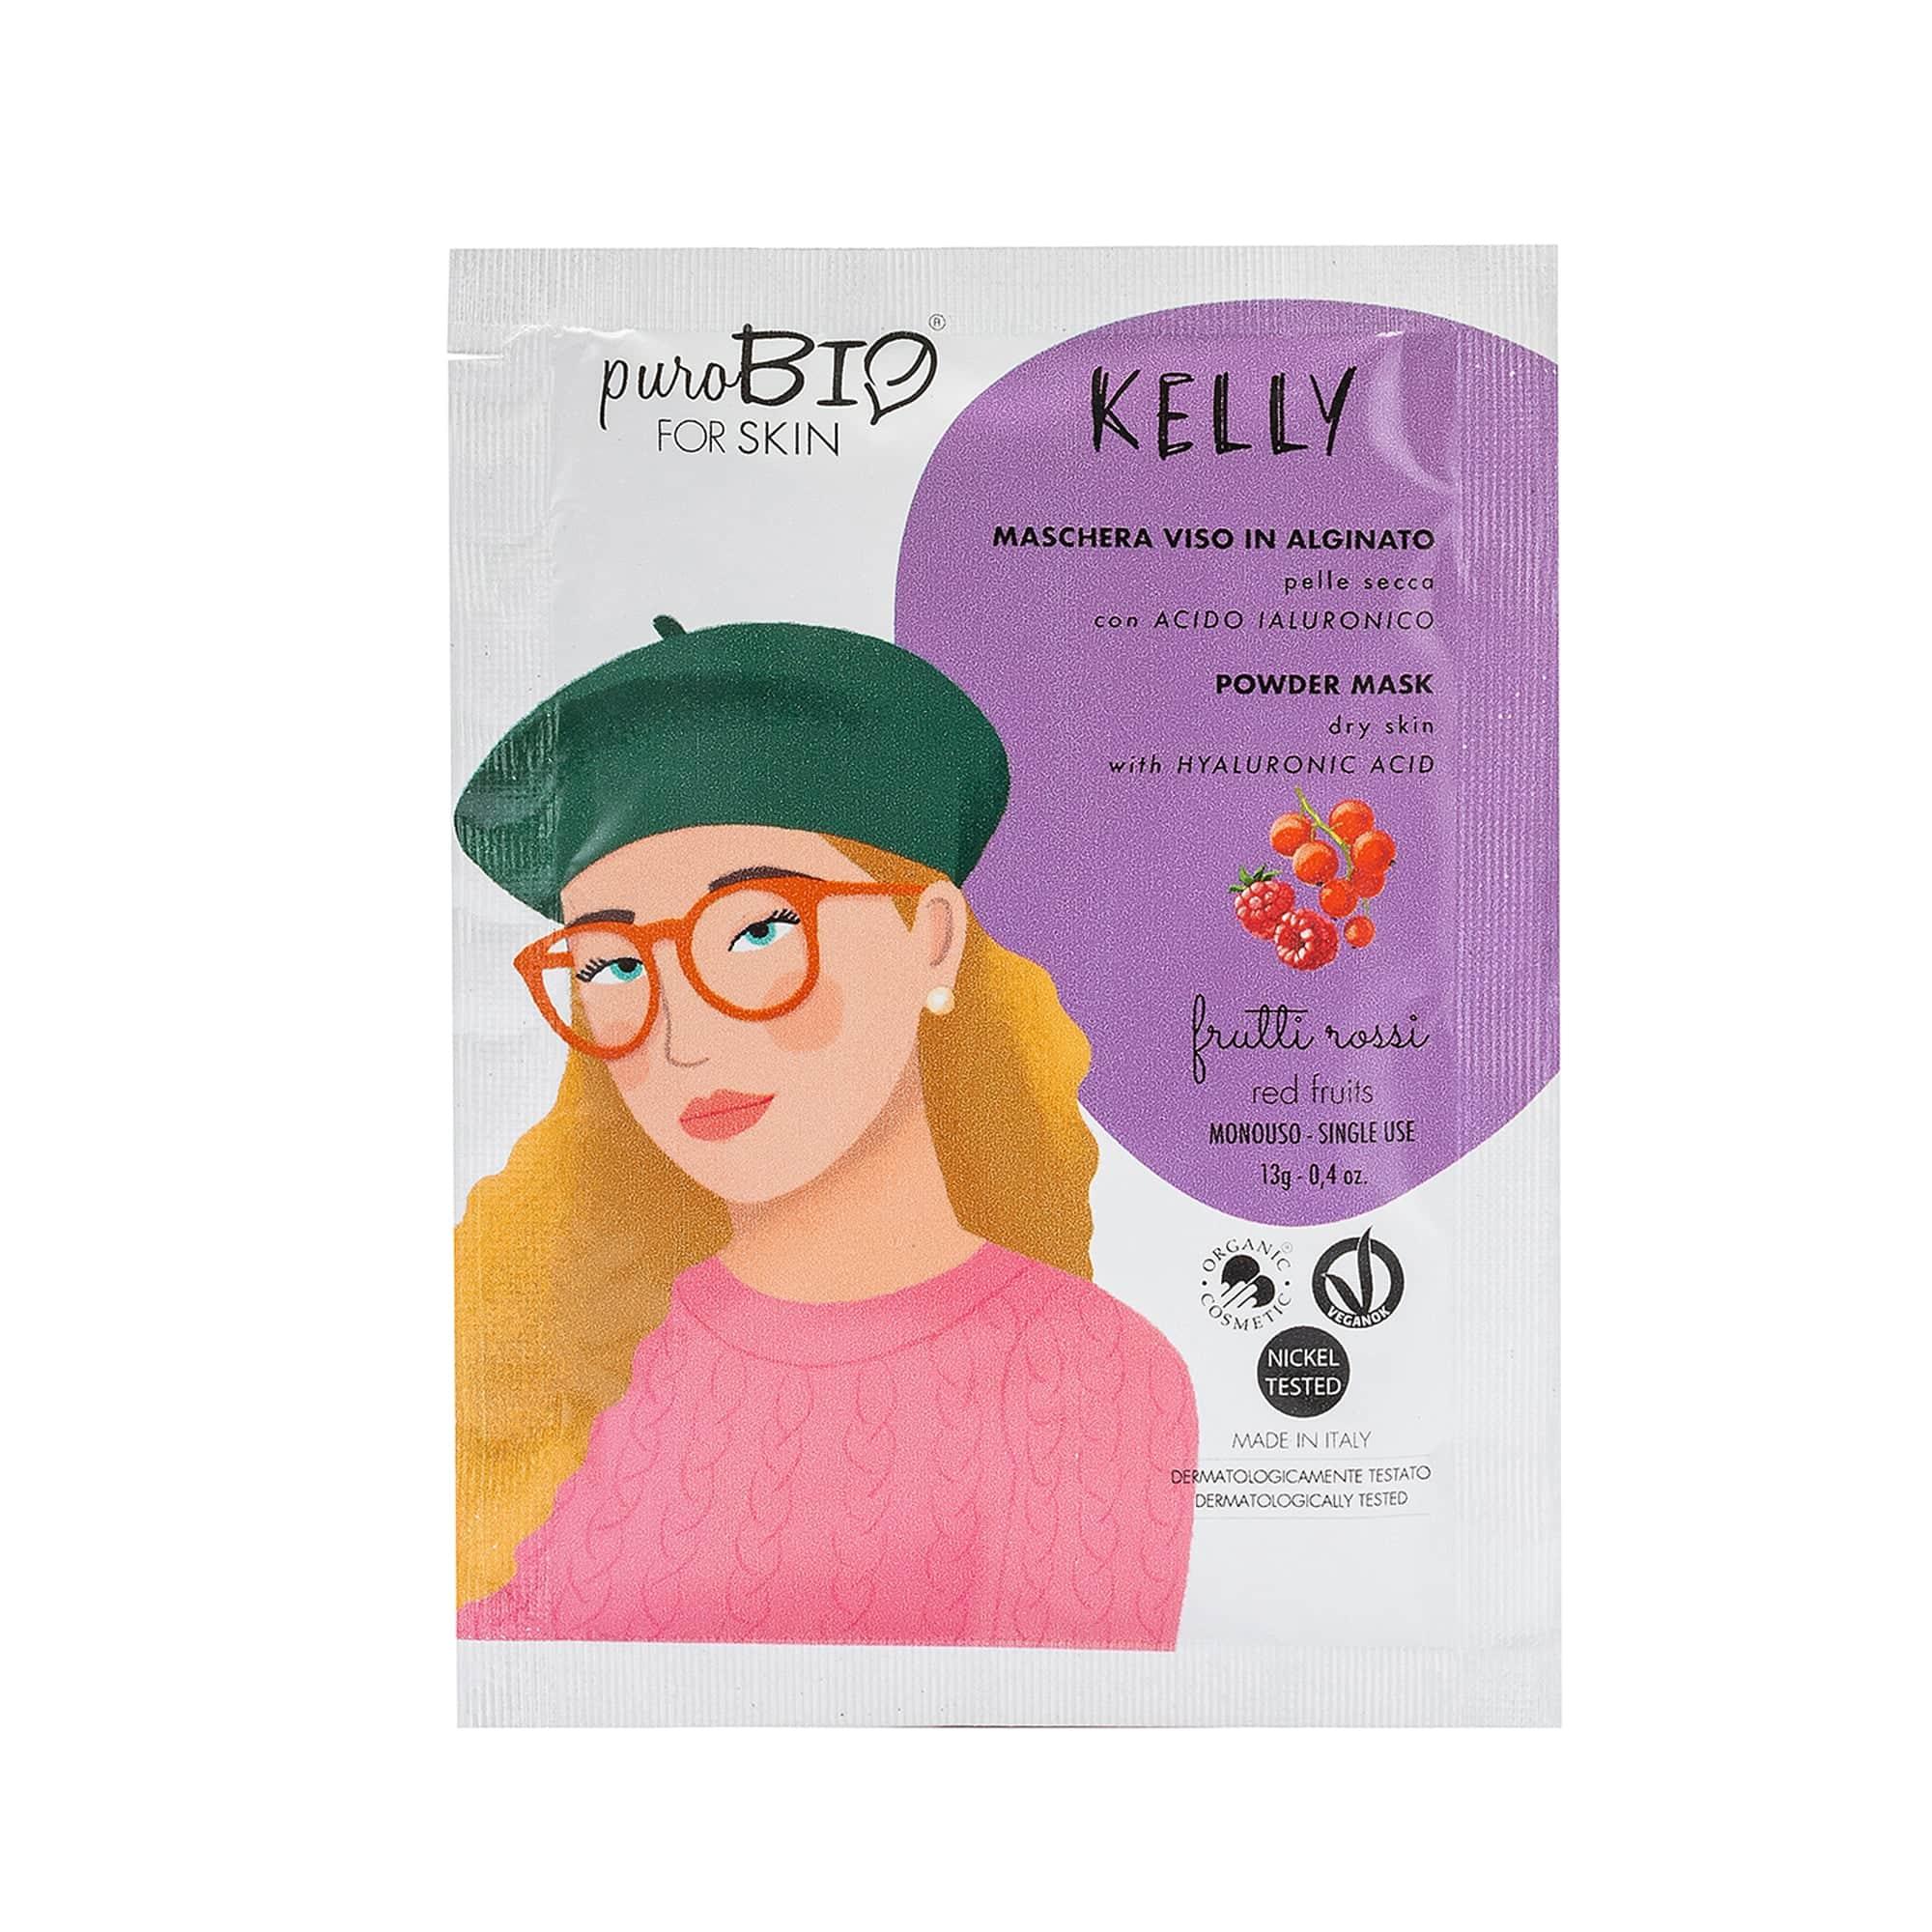 Kelly-fruits rouges-min